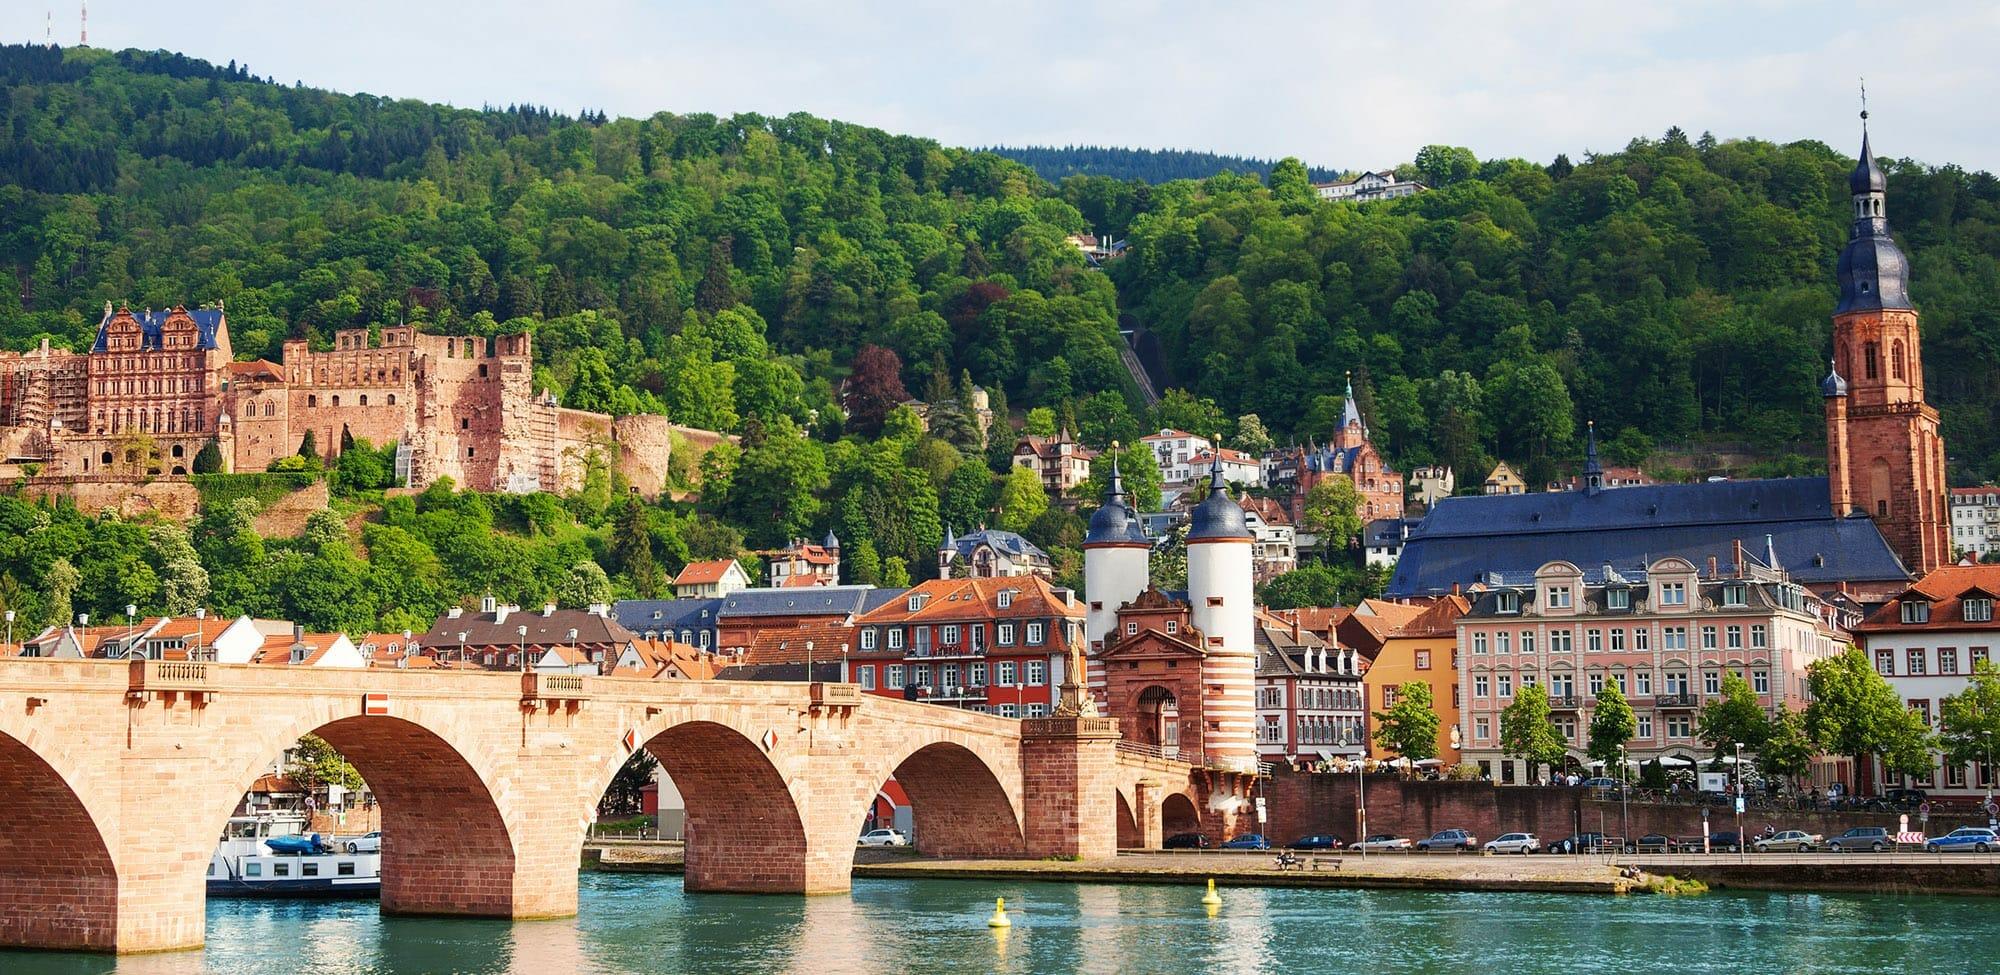 Alte Brücke Heidelberg, Heidelberg,Sehenswürdigkeit, Reiseführer, Reisetipps, Highlights, Rundgang, Sightseeing, Stadtplan